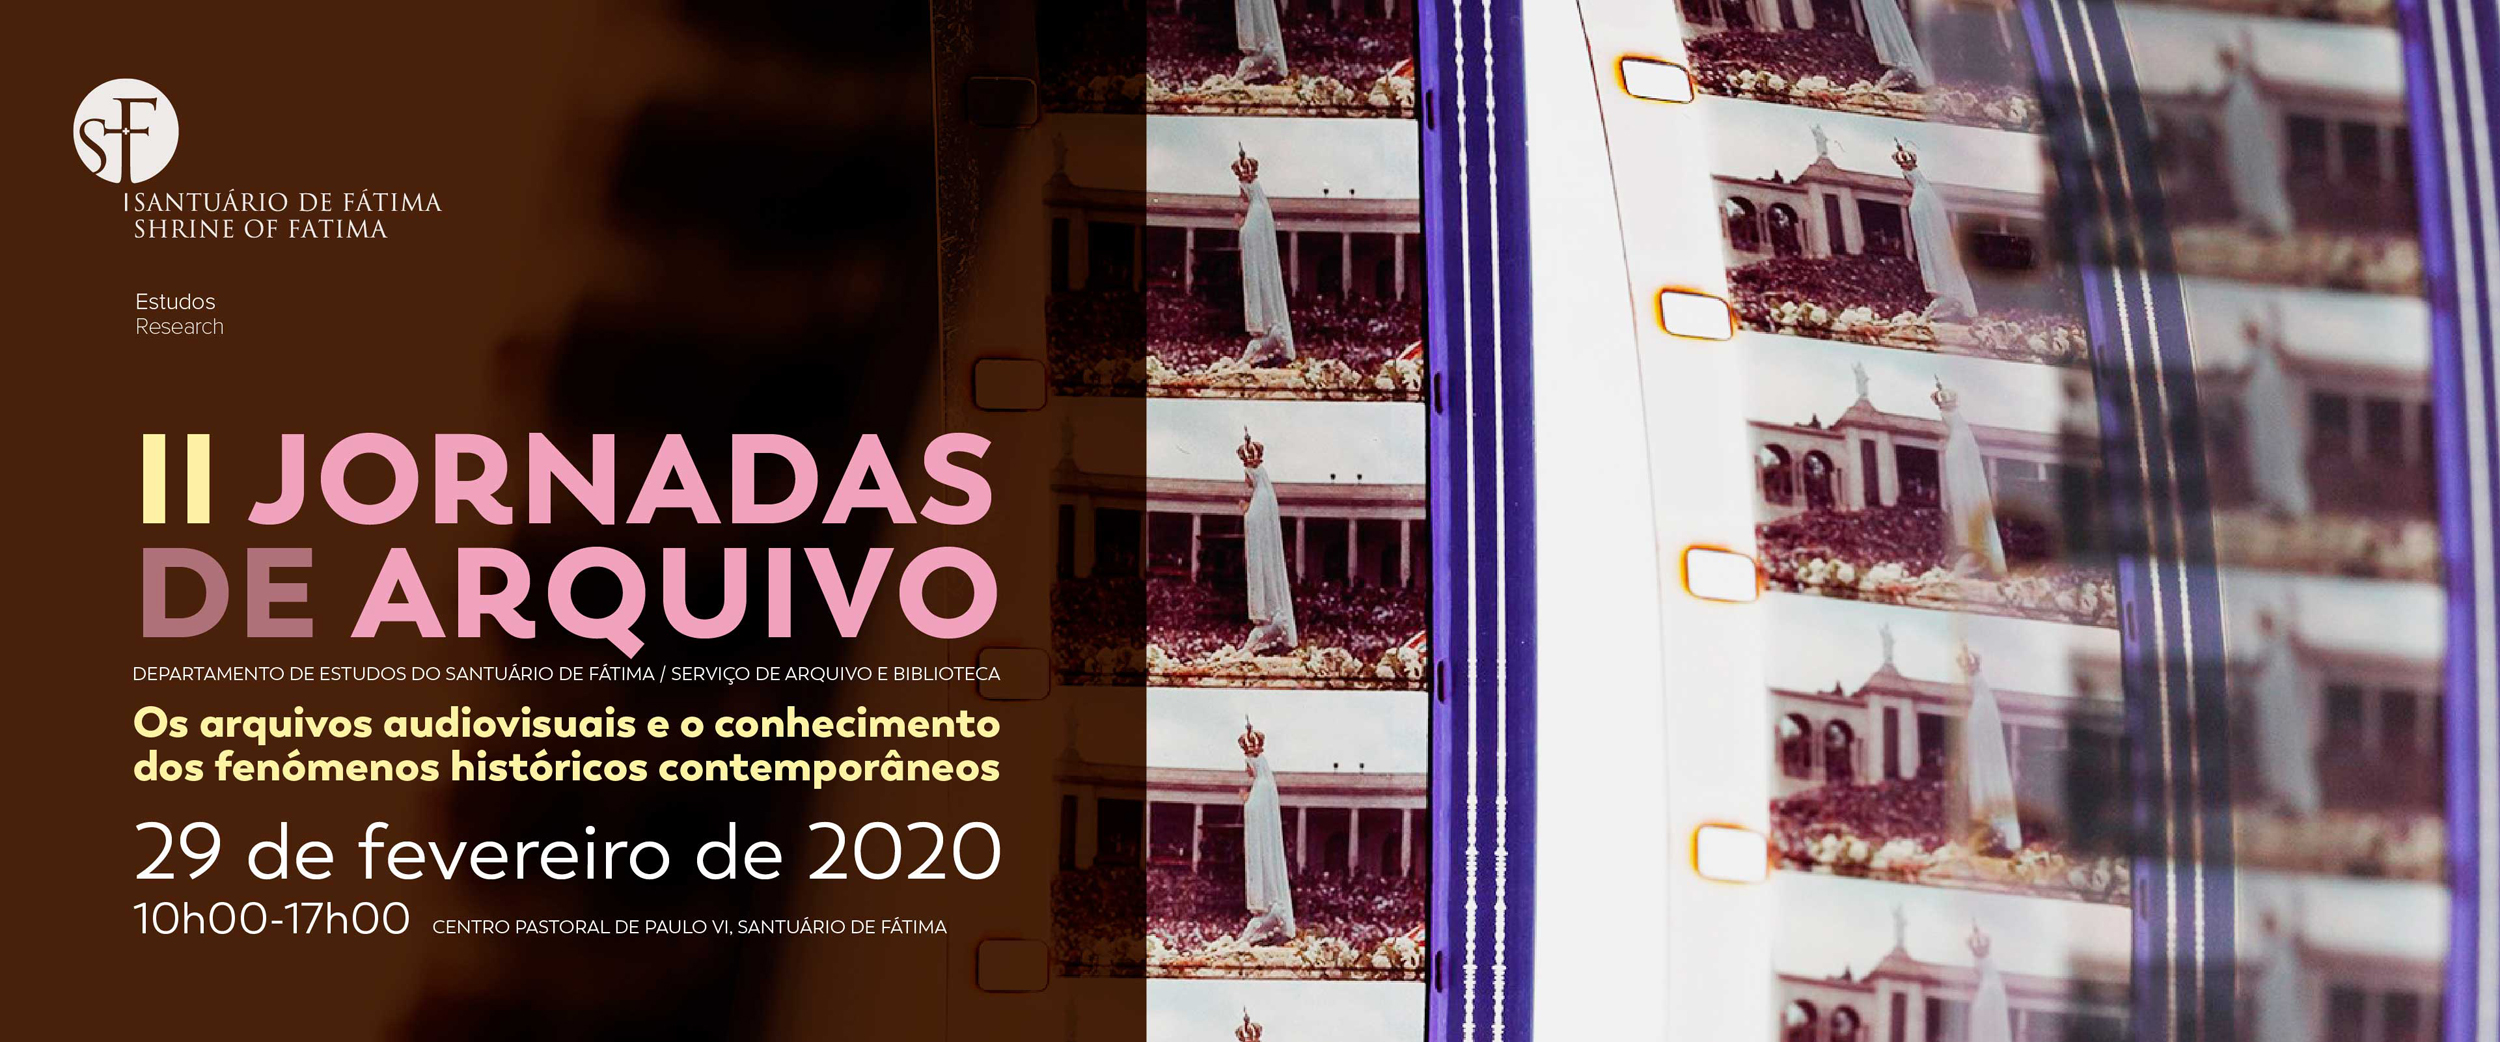 2020-01-29_Jornadas_Arquivo.jpg